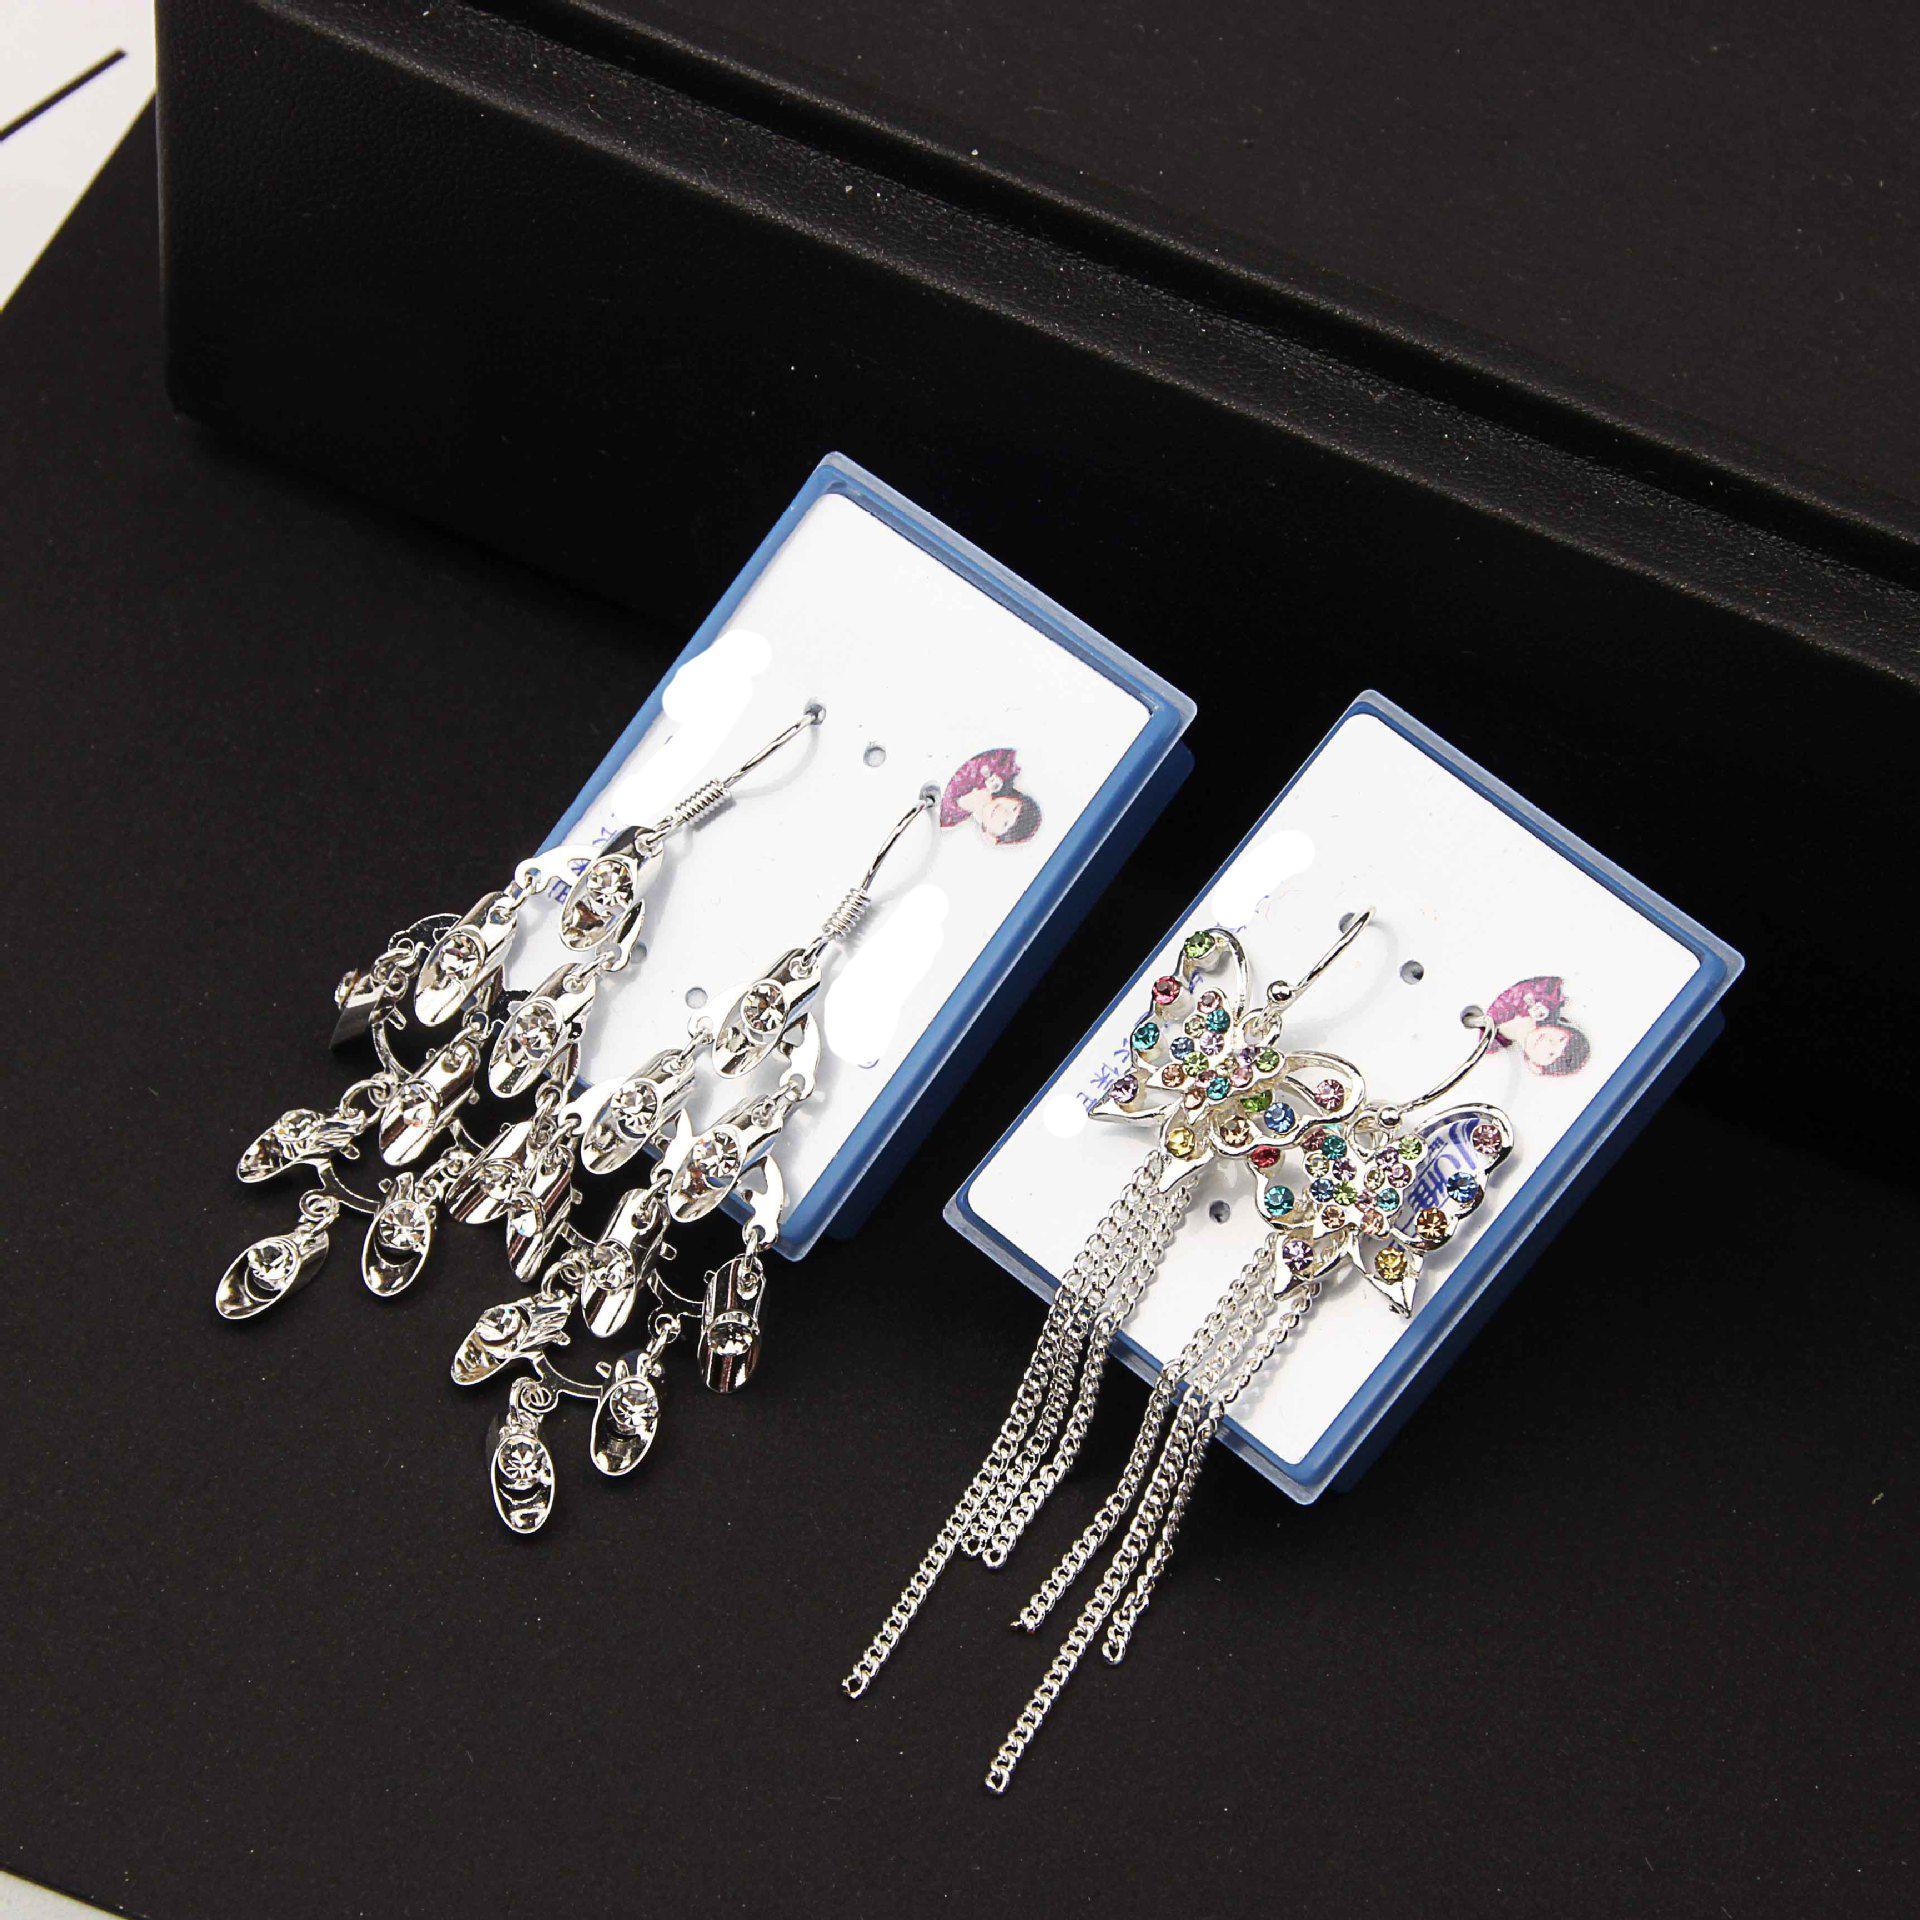 mix 30 style Anti allergy crystal Tassels Earrings Flower Butterfly Peacock love heart Shining Hanging long Earrings box packed